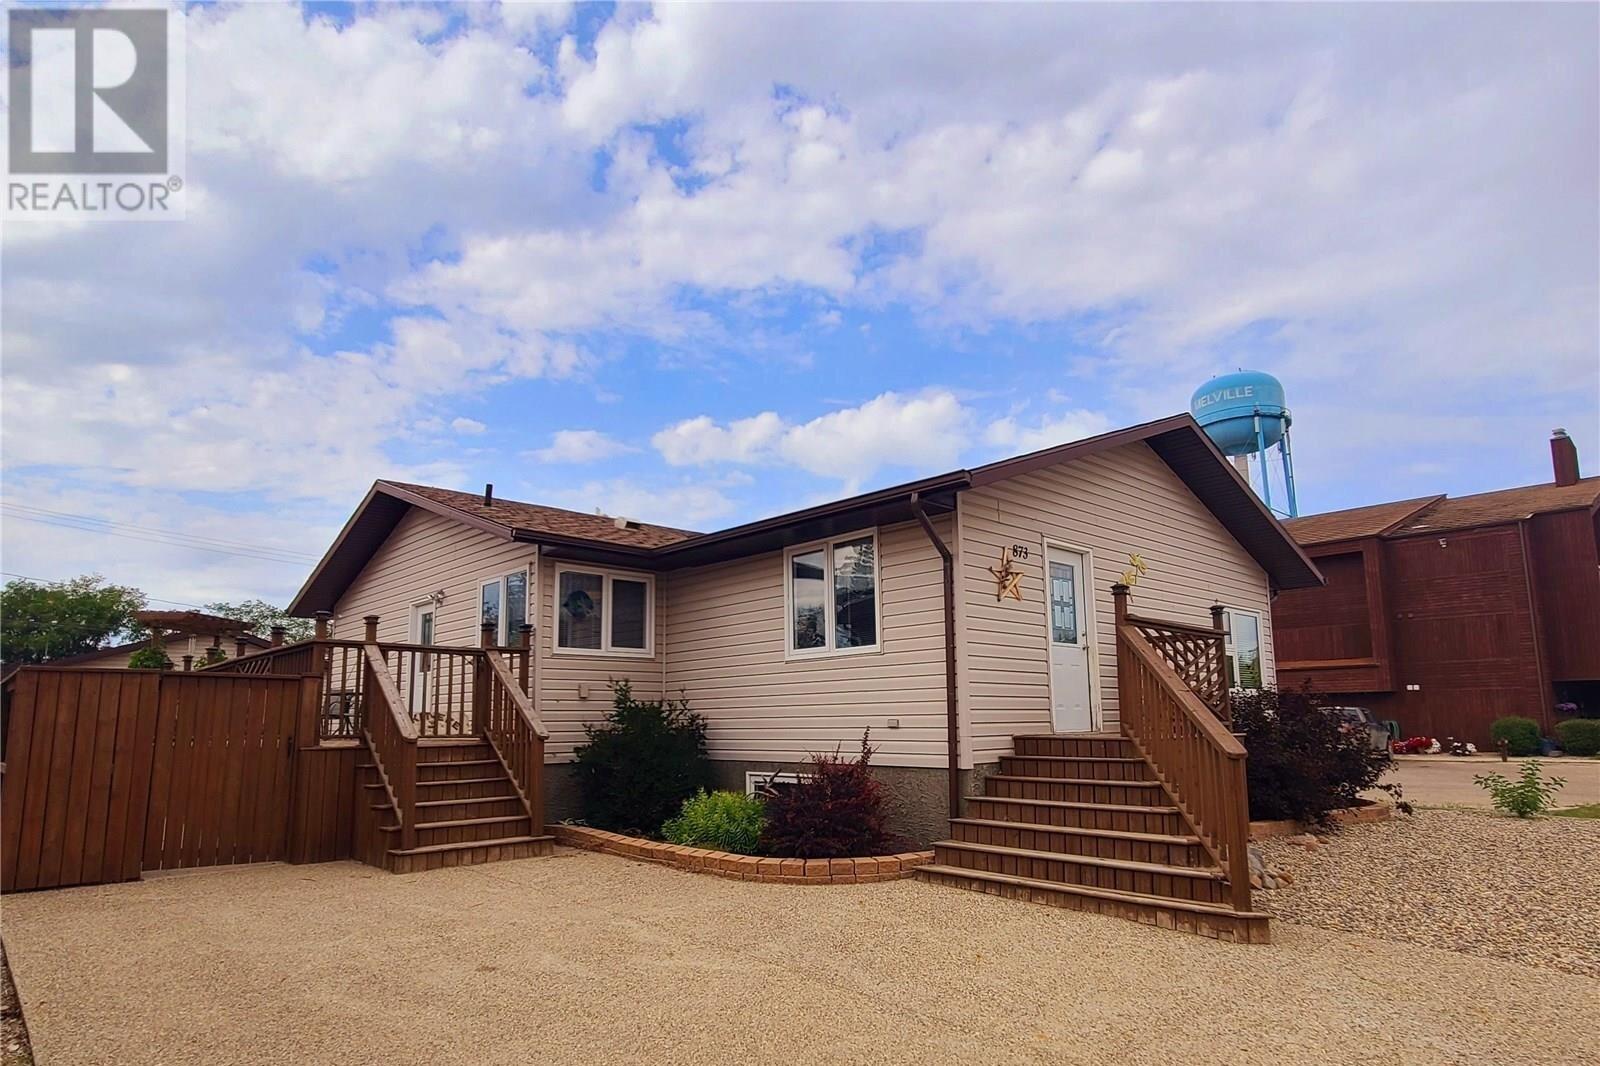 House for sale at 873 Scotia St Melville Saskatchewan - MLS: SK834795